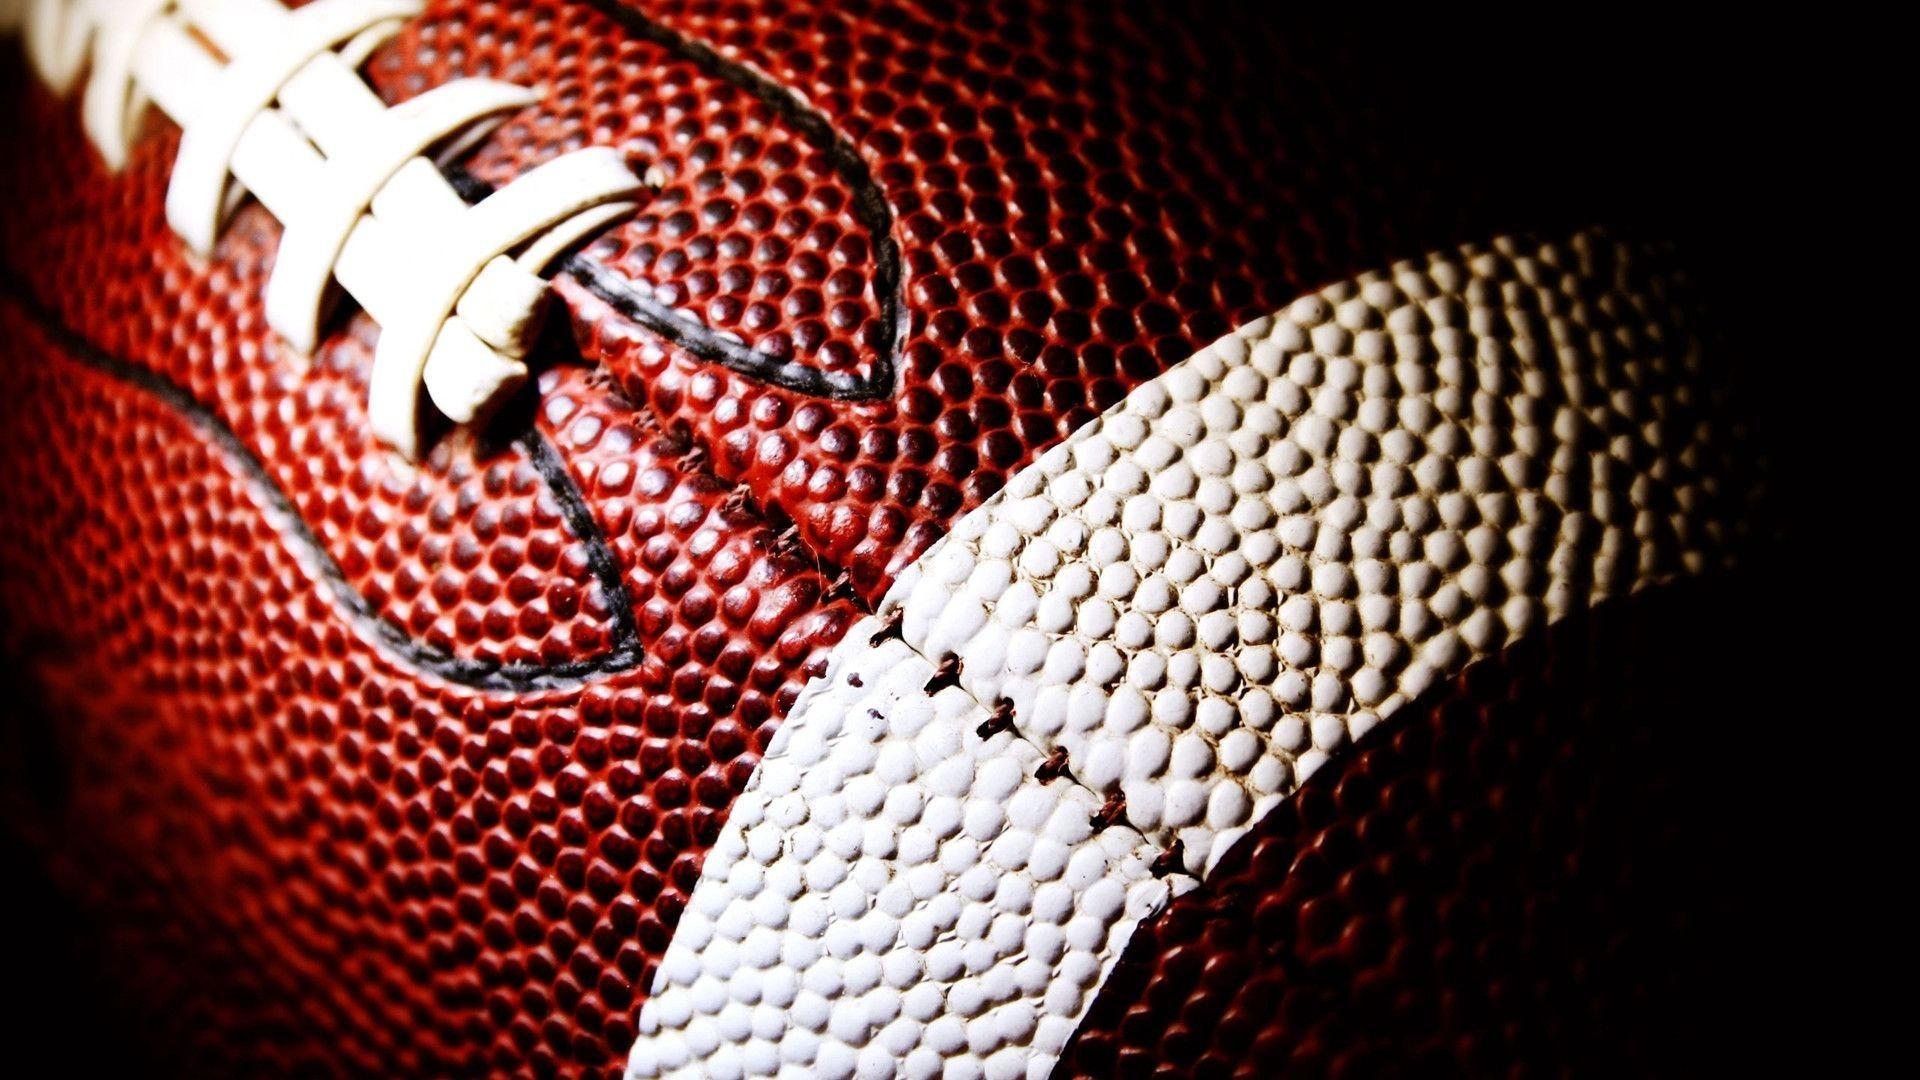 Nfl Football Screensavers: NFL Wallpaper And Screensavers (54+ Images